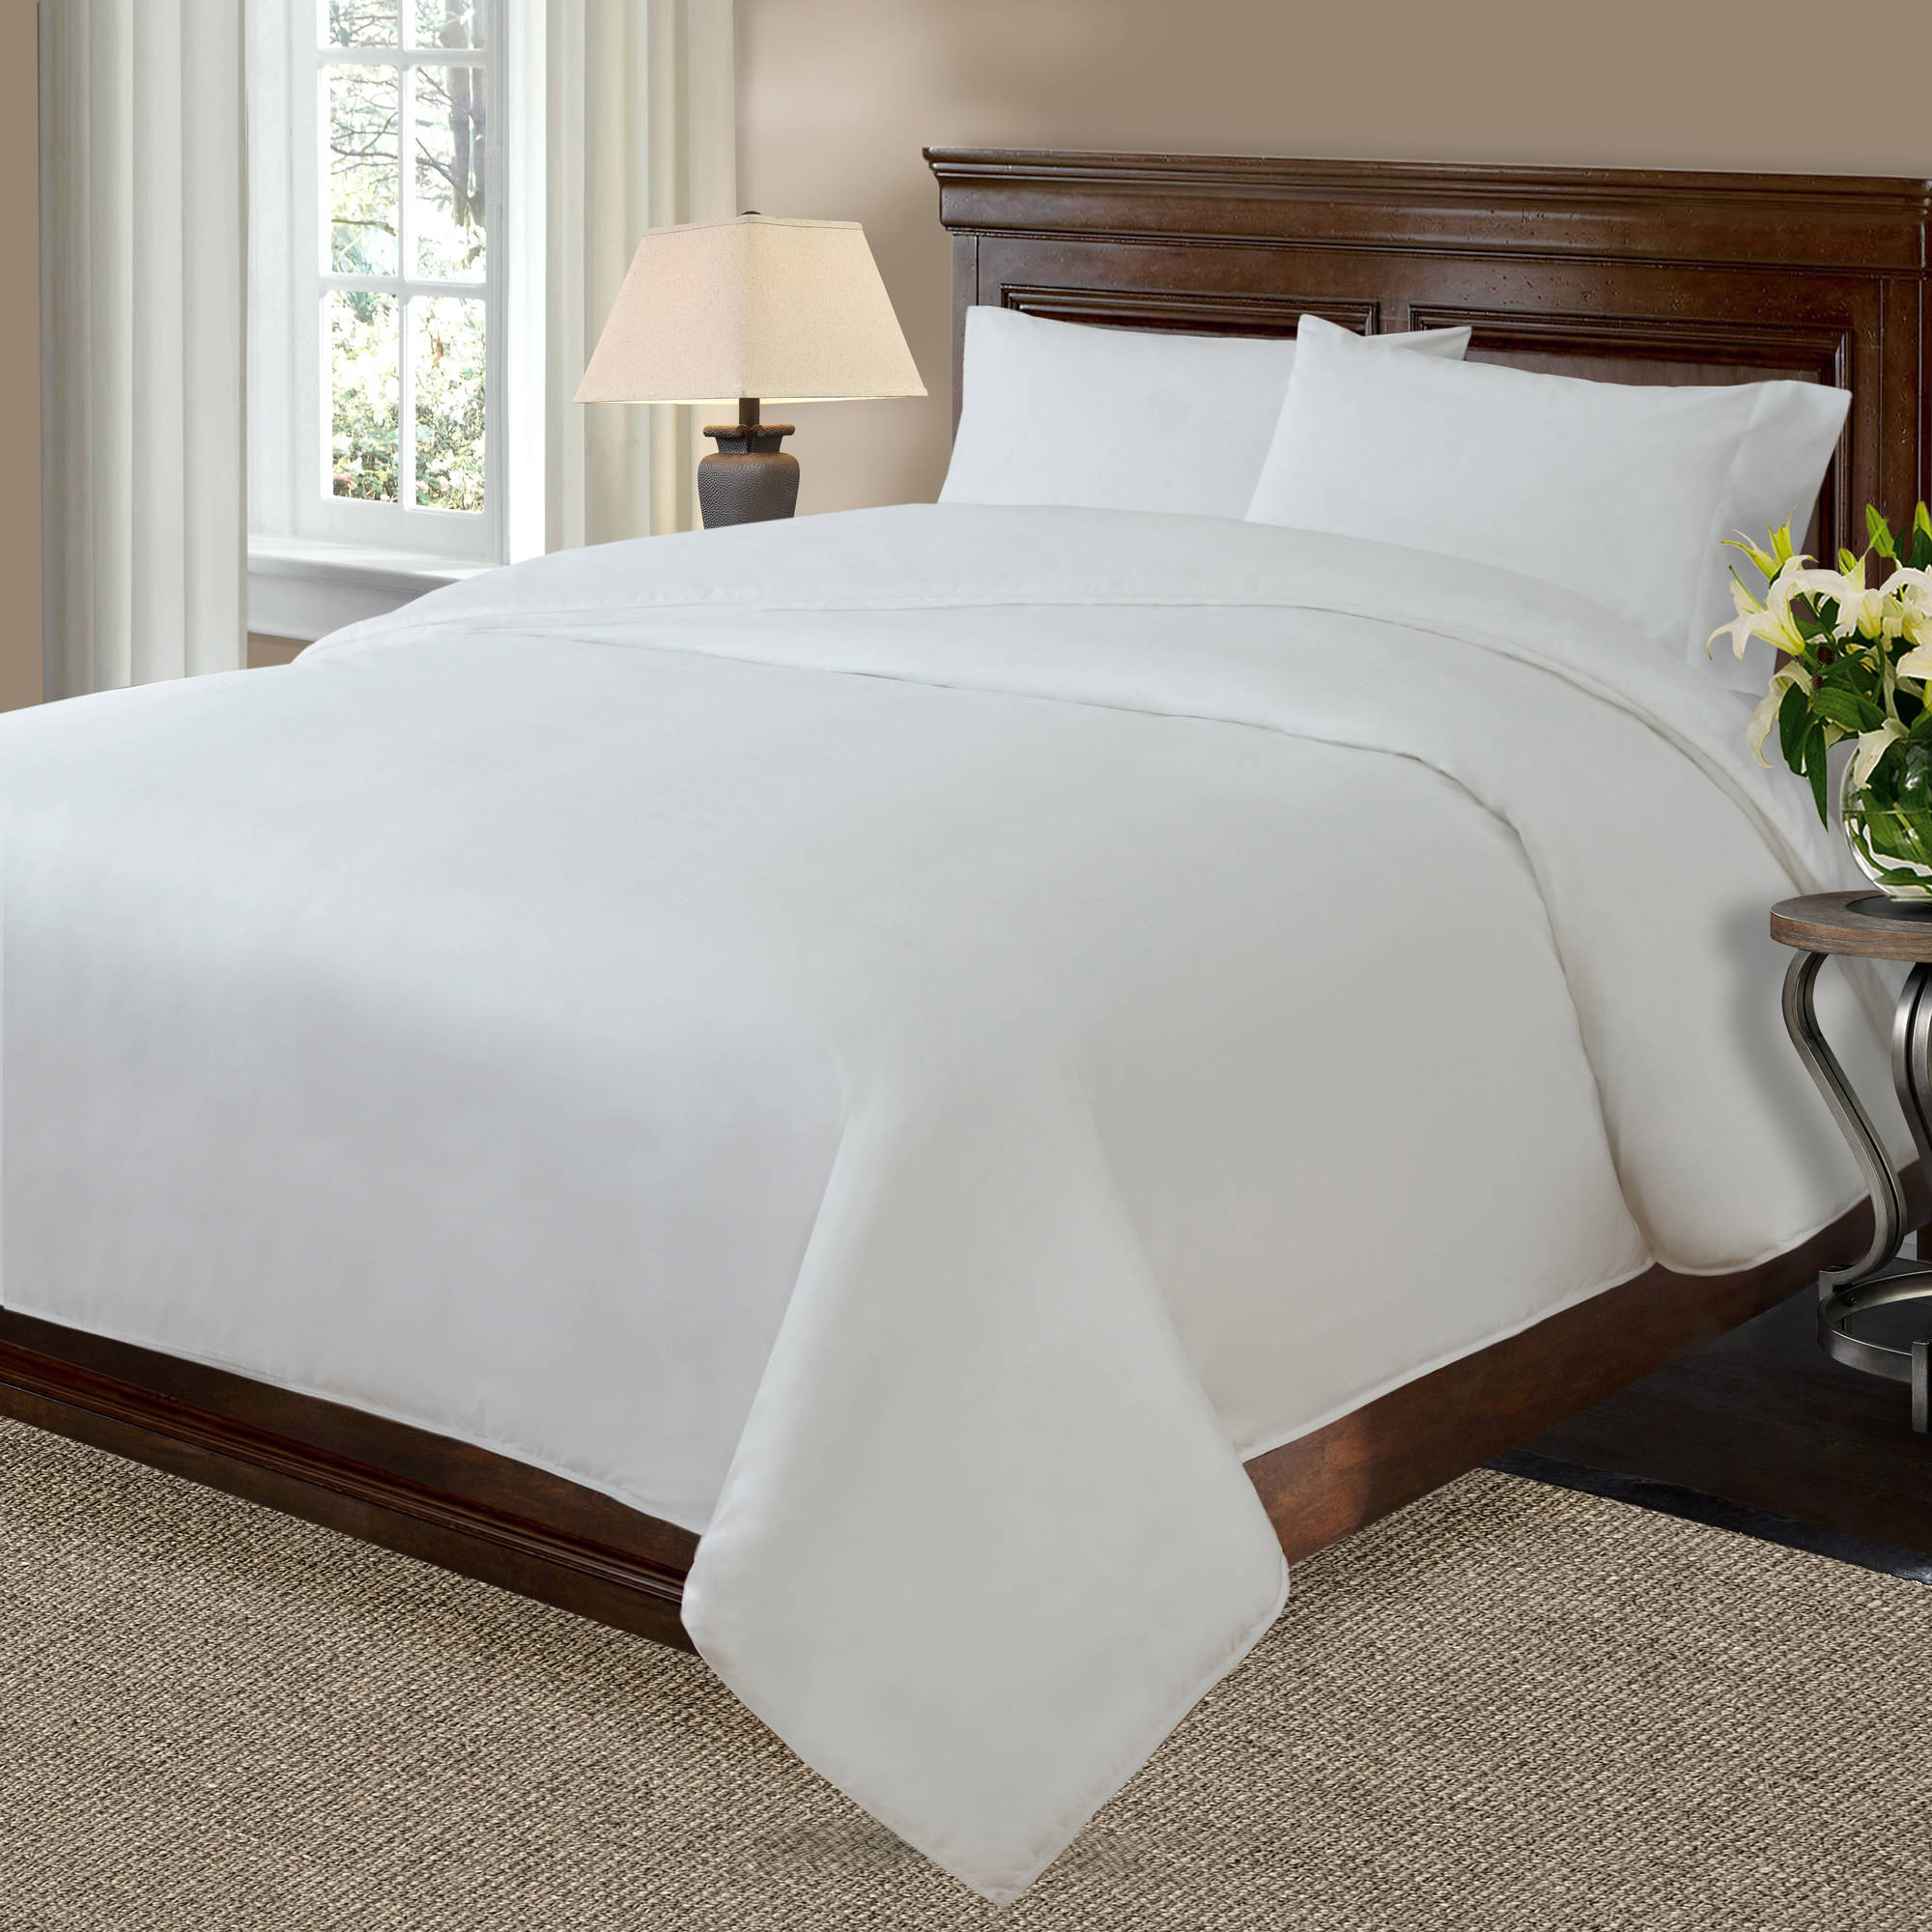 Carefree Comforts Wonder Comforter